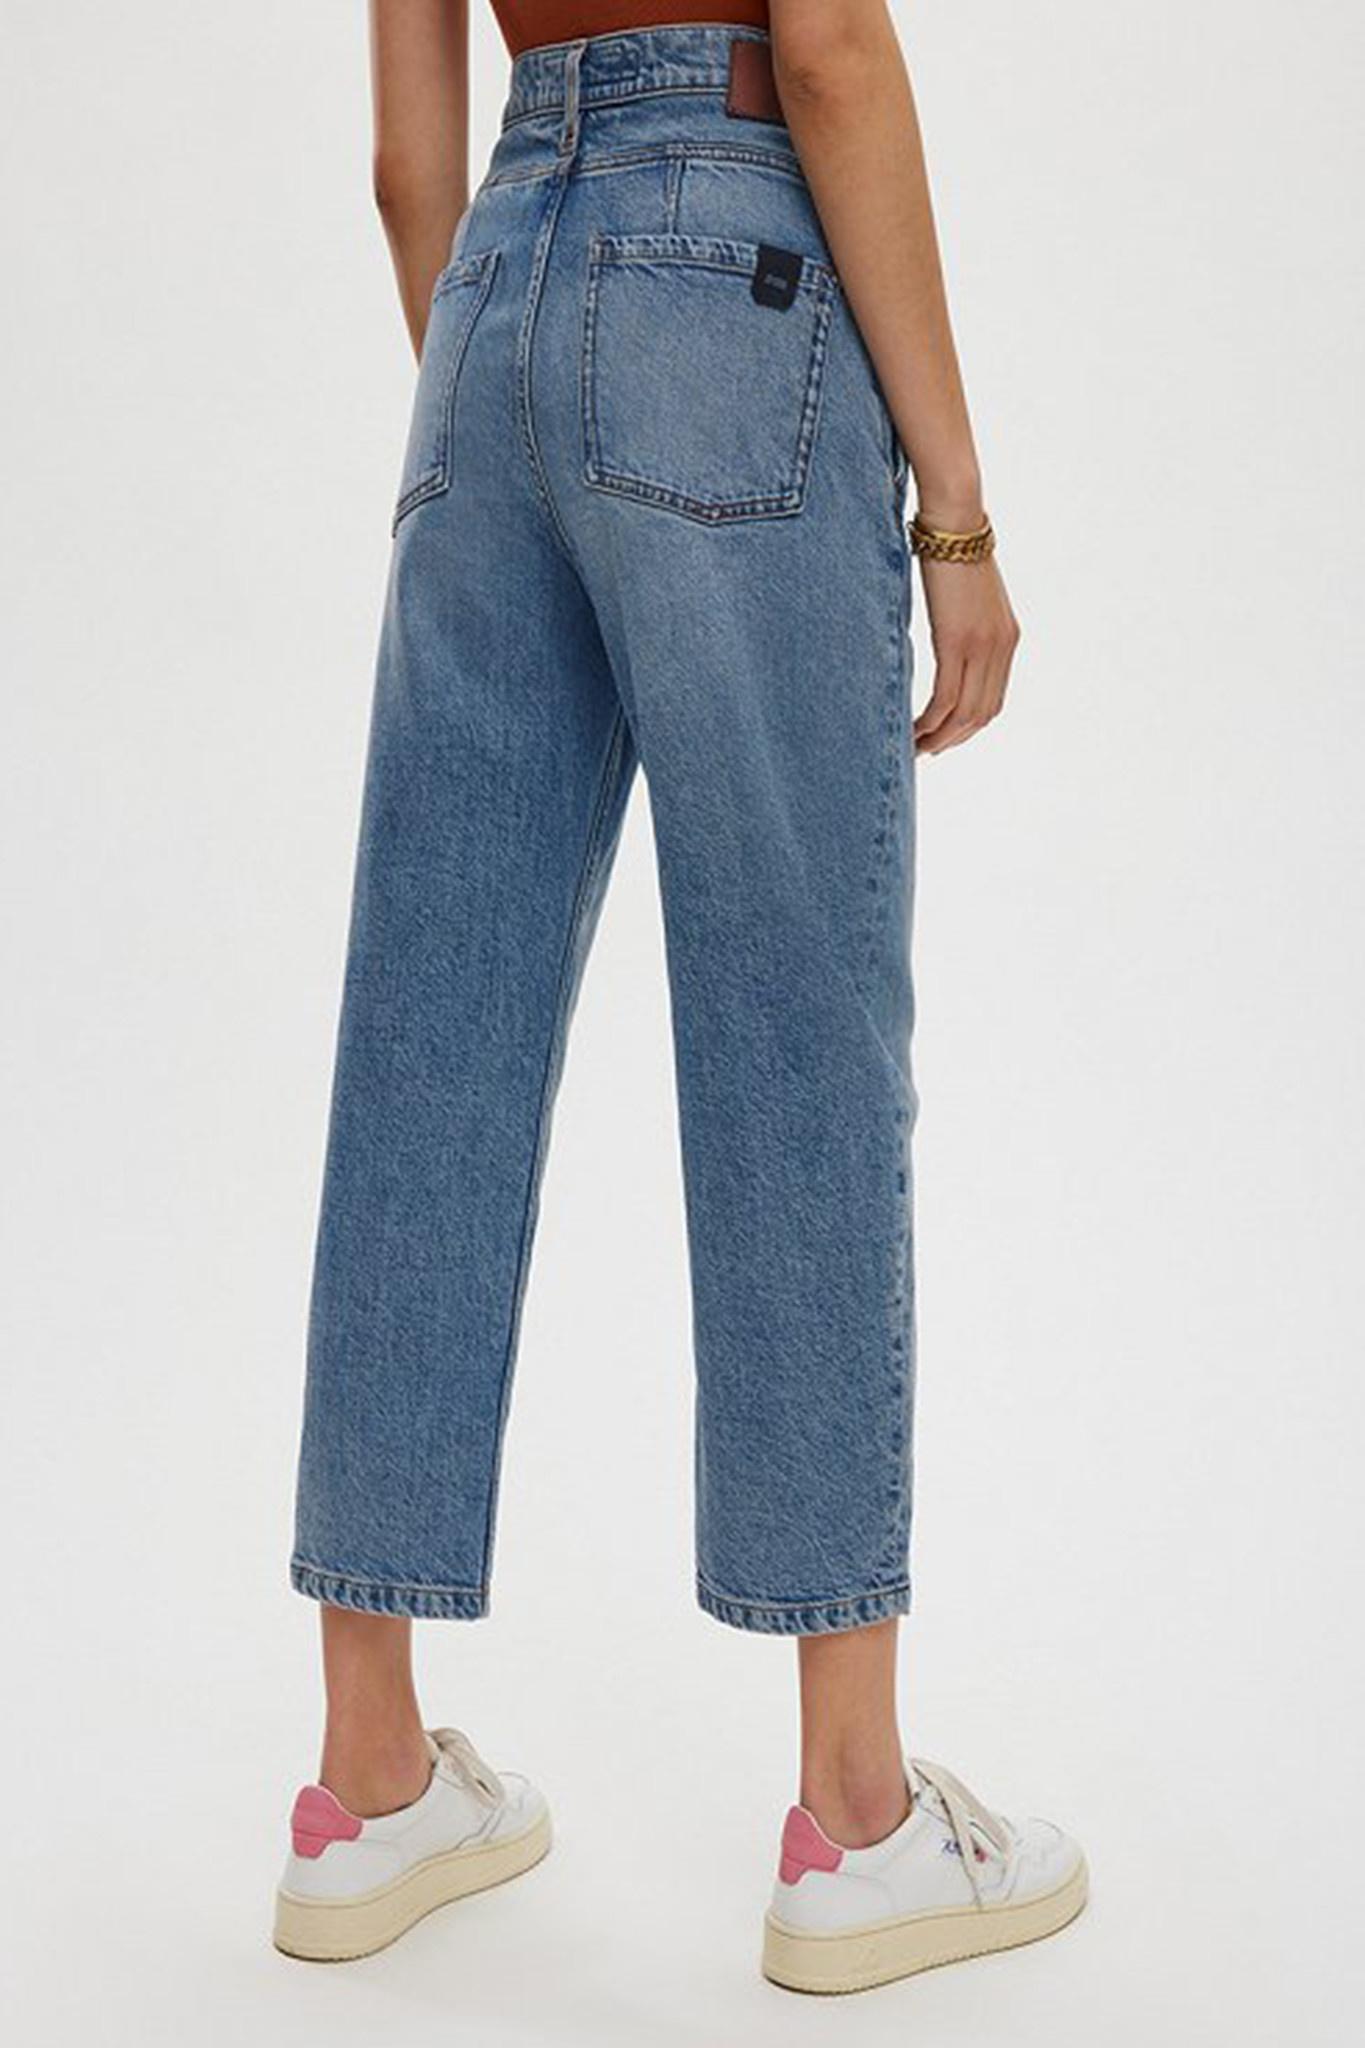 Mind Jeans - Blue-2